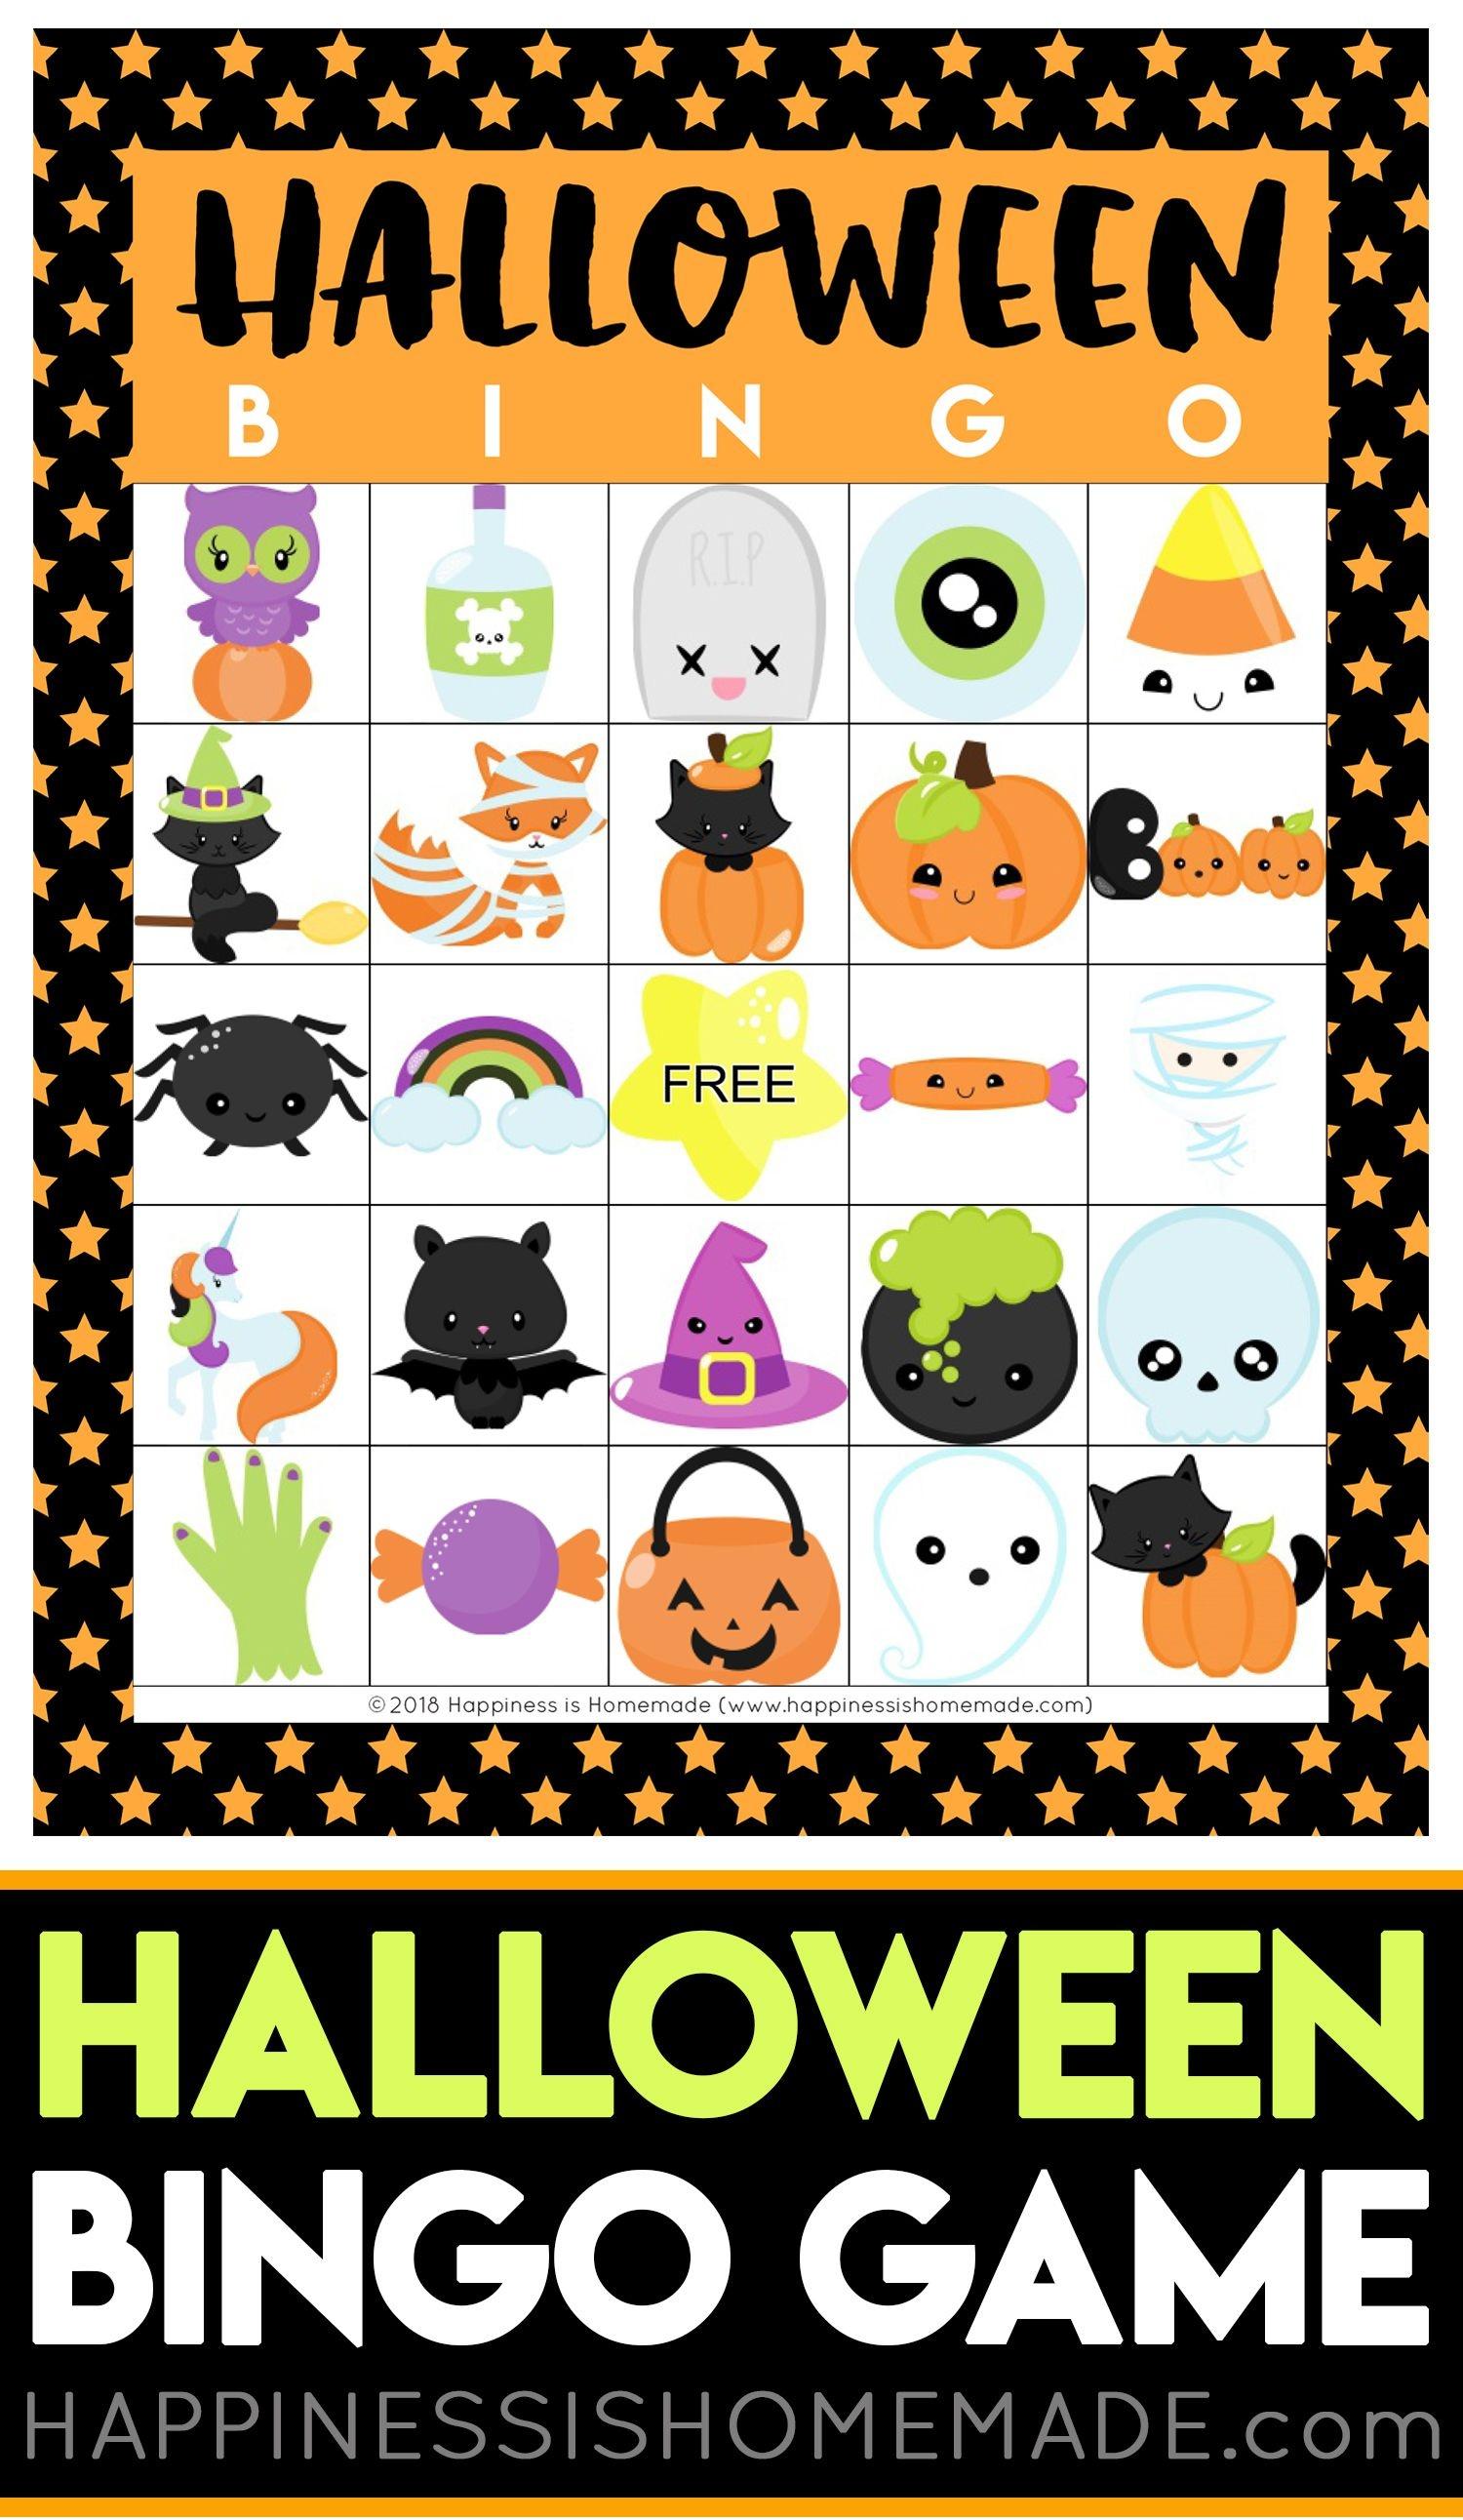 Printable Halloween Bingo Cards - This Halloween Bingo Game Is A Ton - Free Printable Halloween Bingo Cards